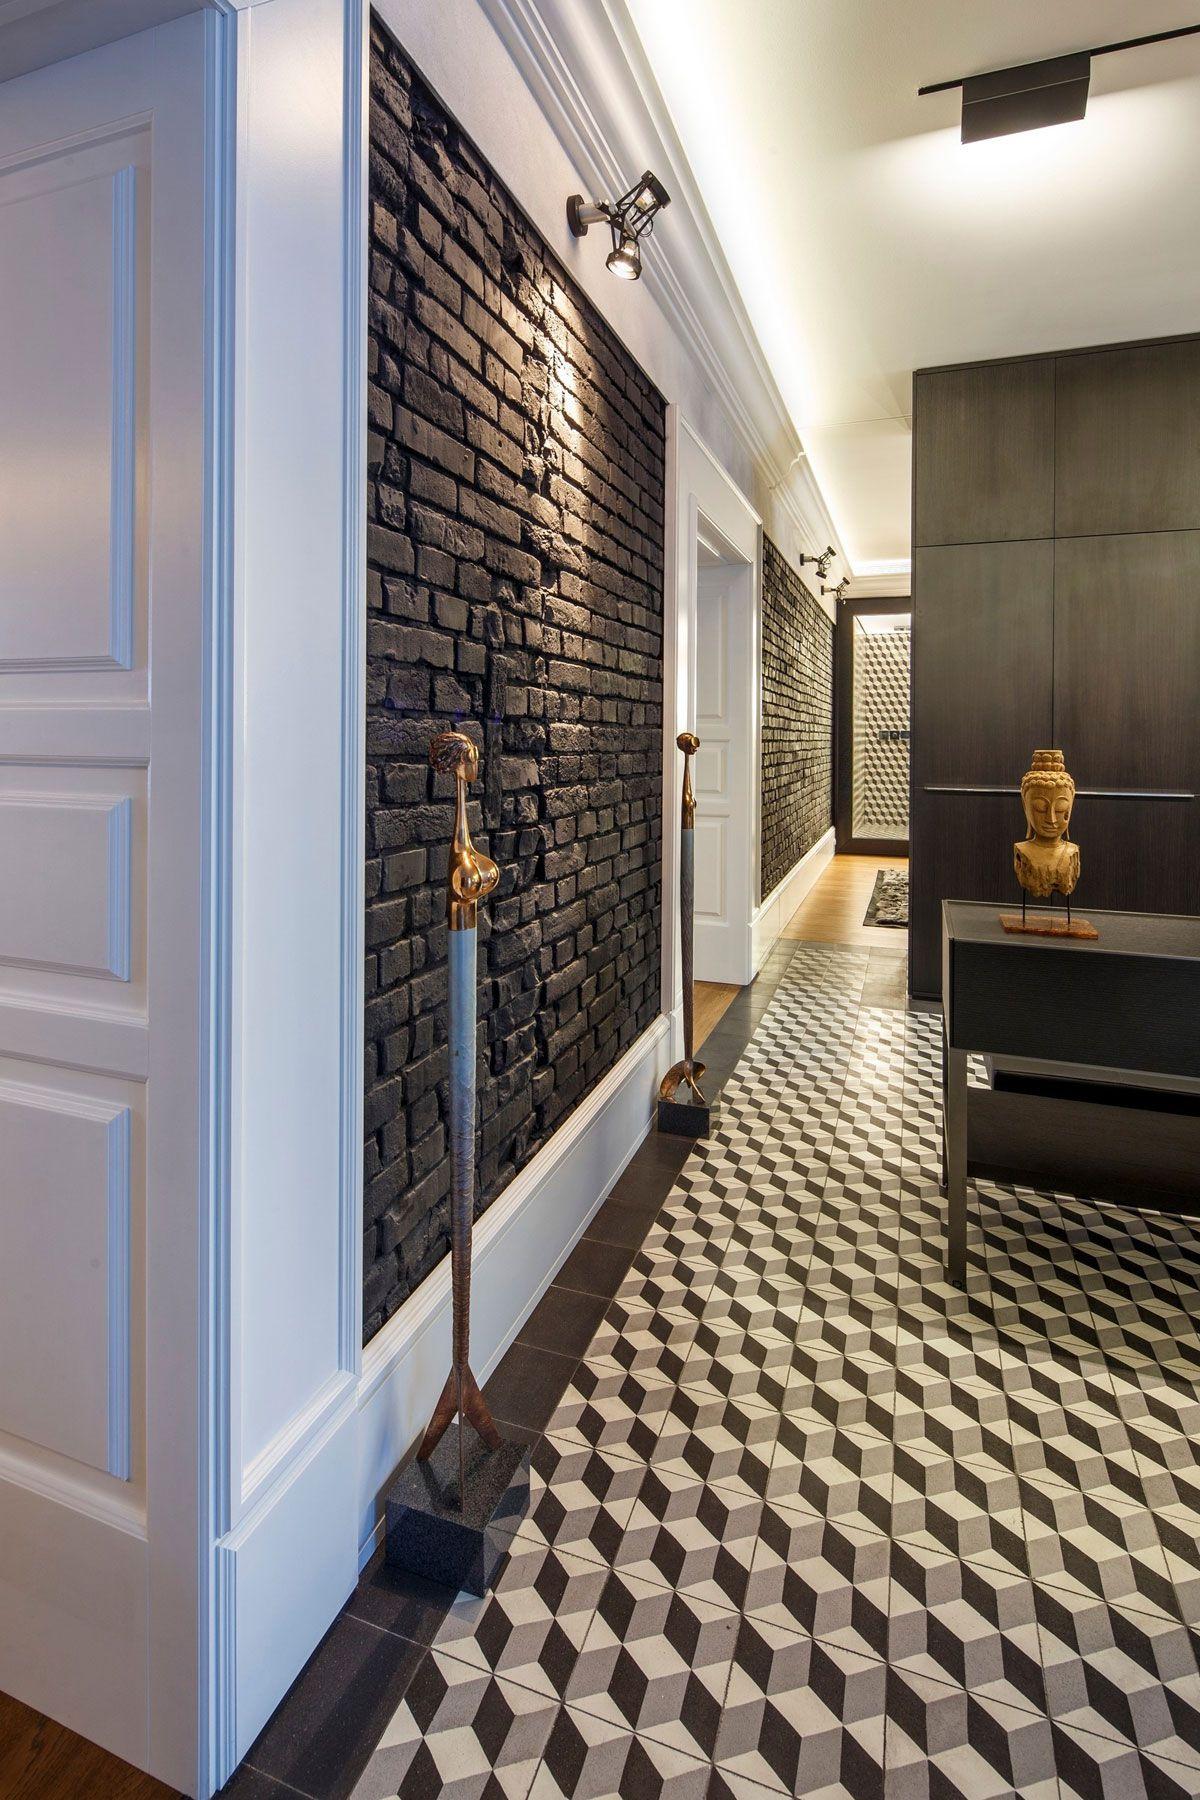 Modern Style Apartment modern style of man's choice 2 apartmentat26 - caandesign